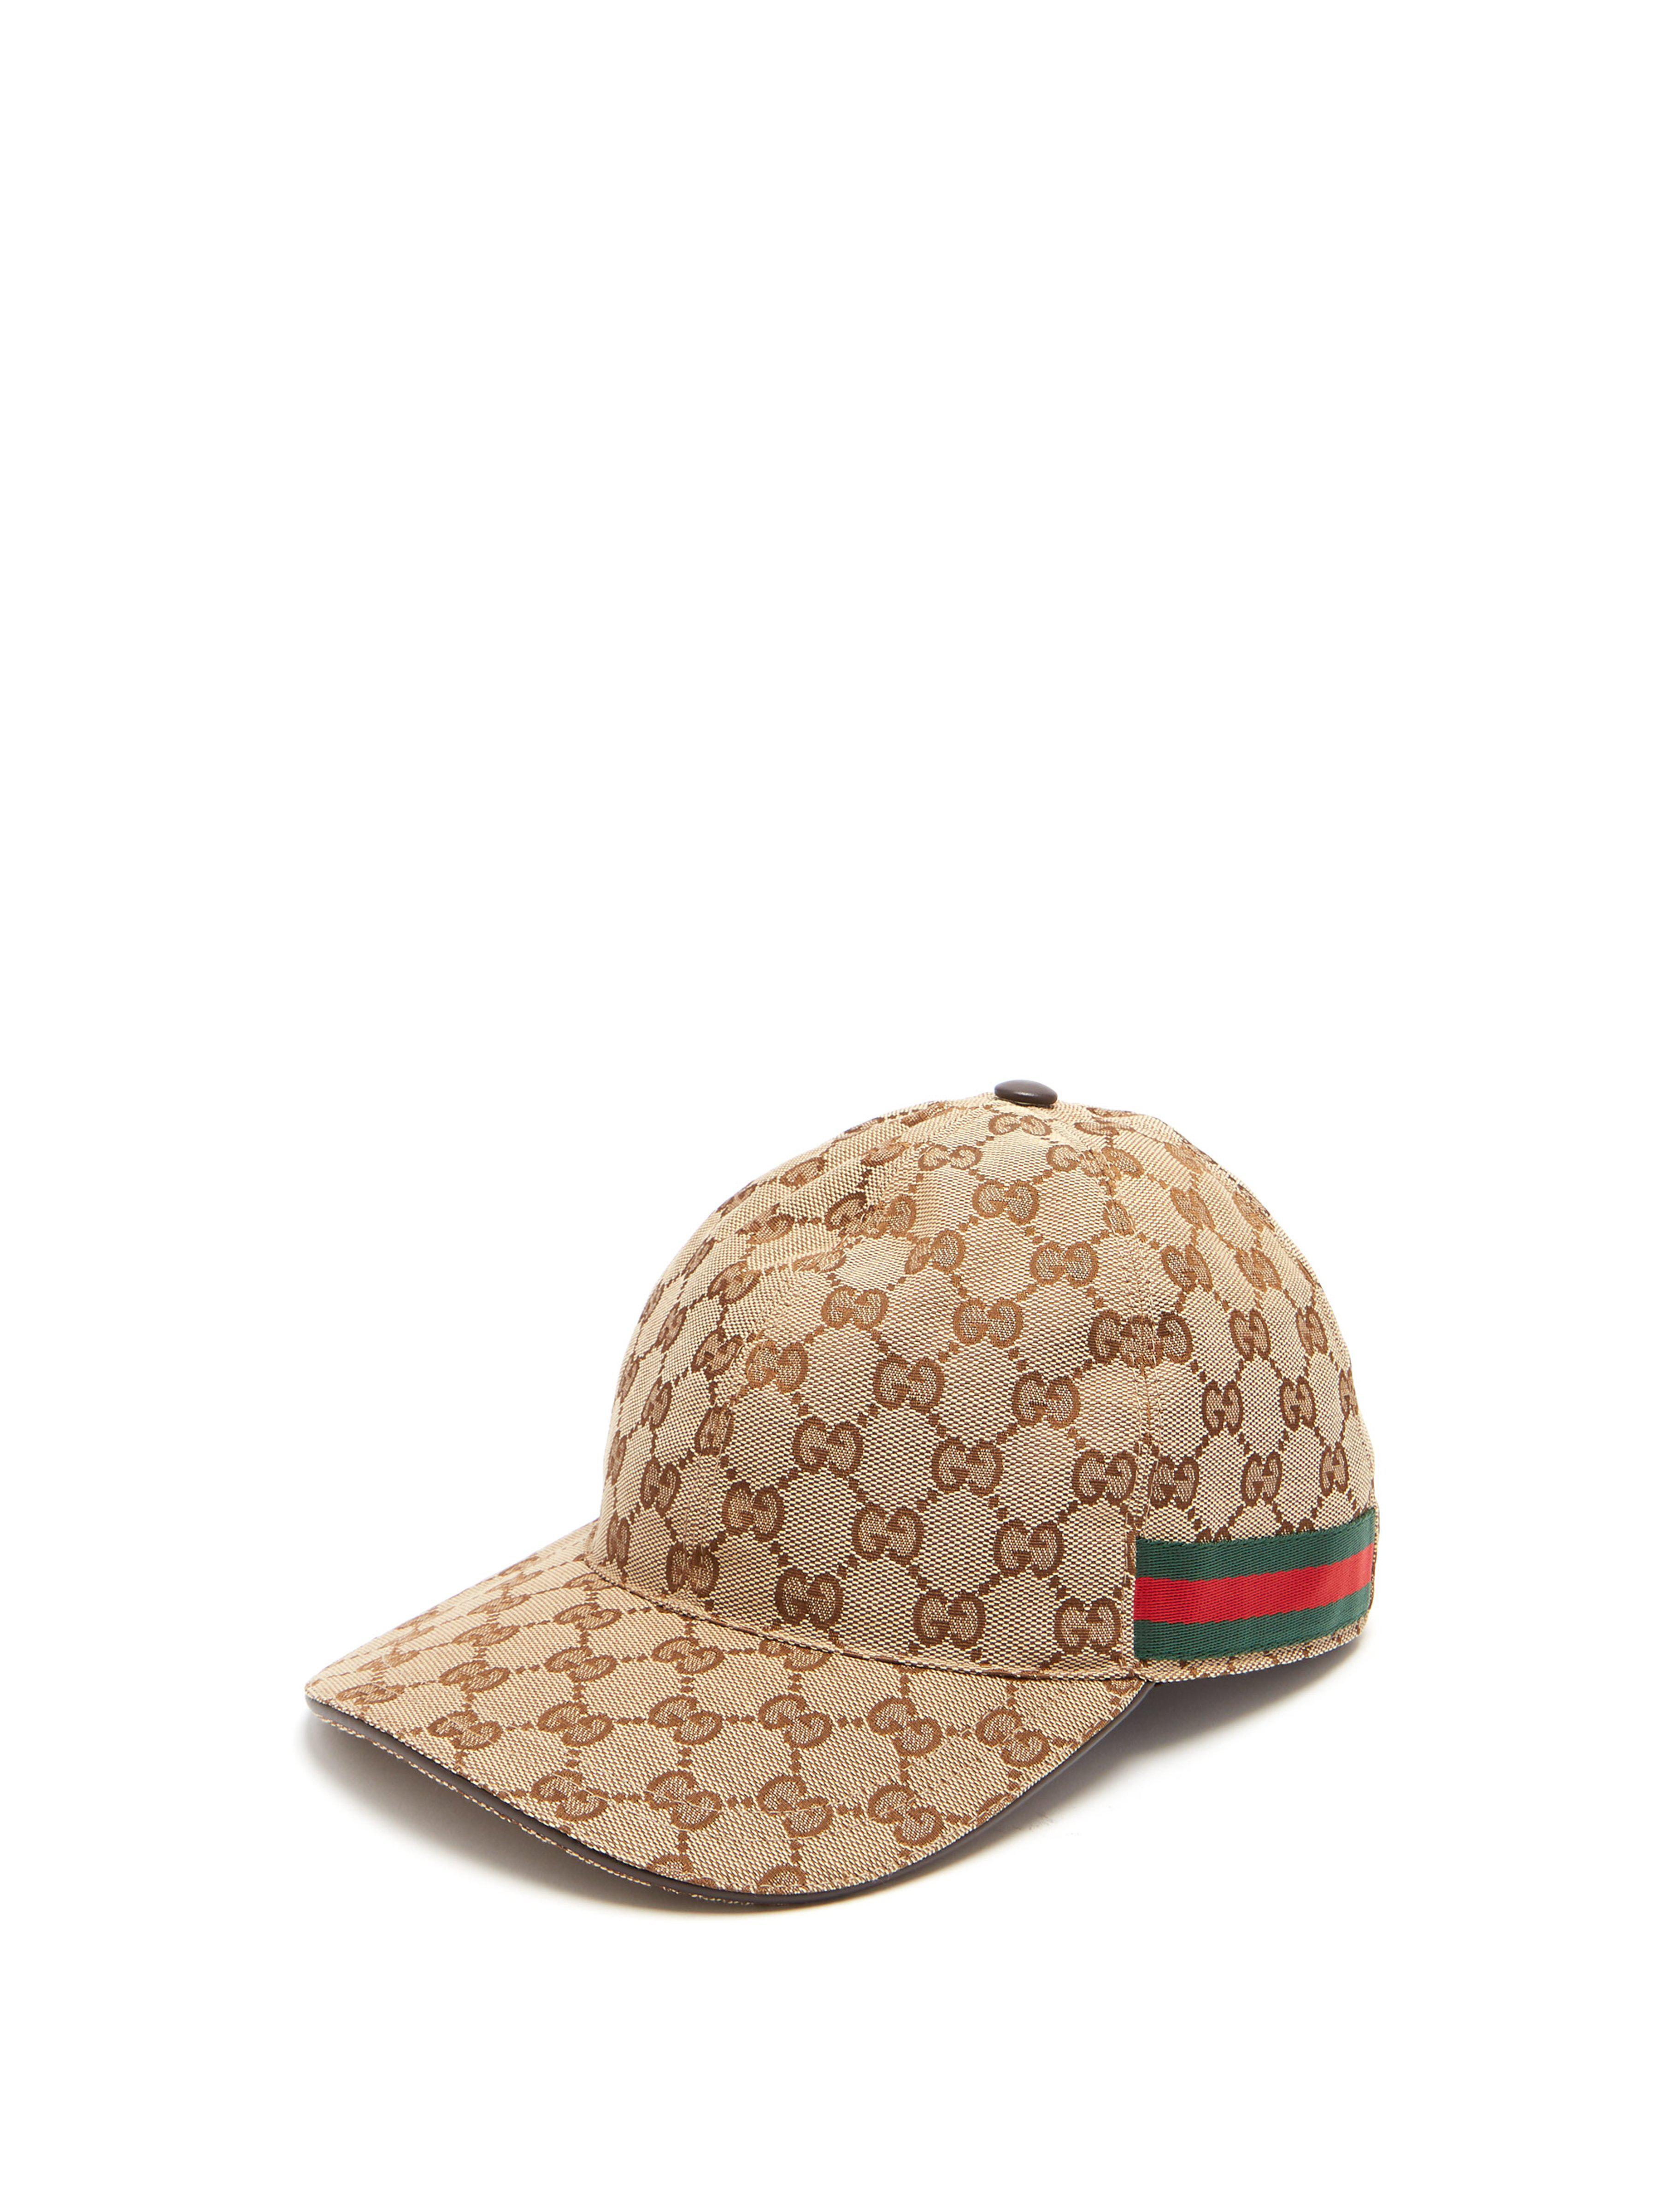 e9408be1358 Gucci Web Stripe Gg Logo Baseball Cap for Men - Save 20% - Lyst